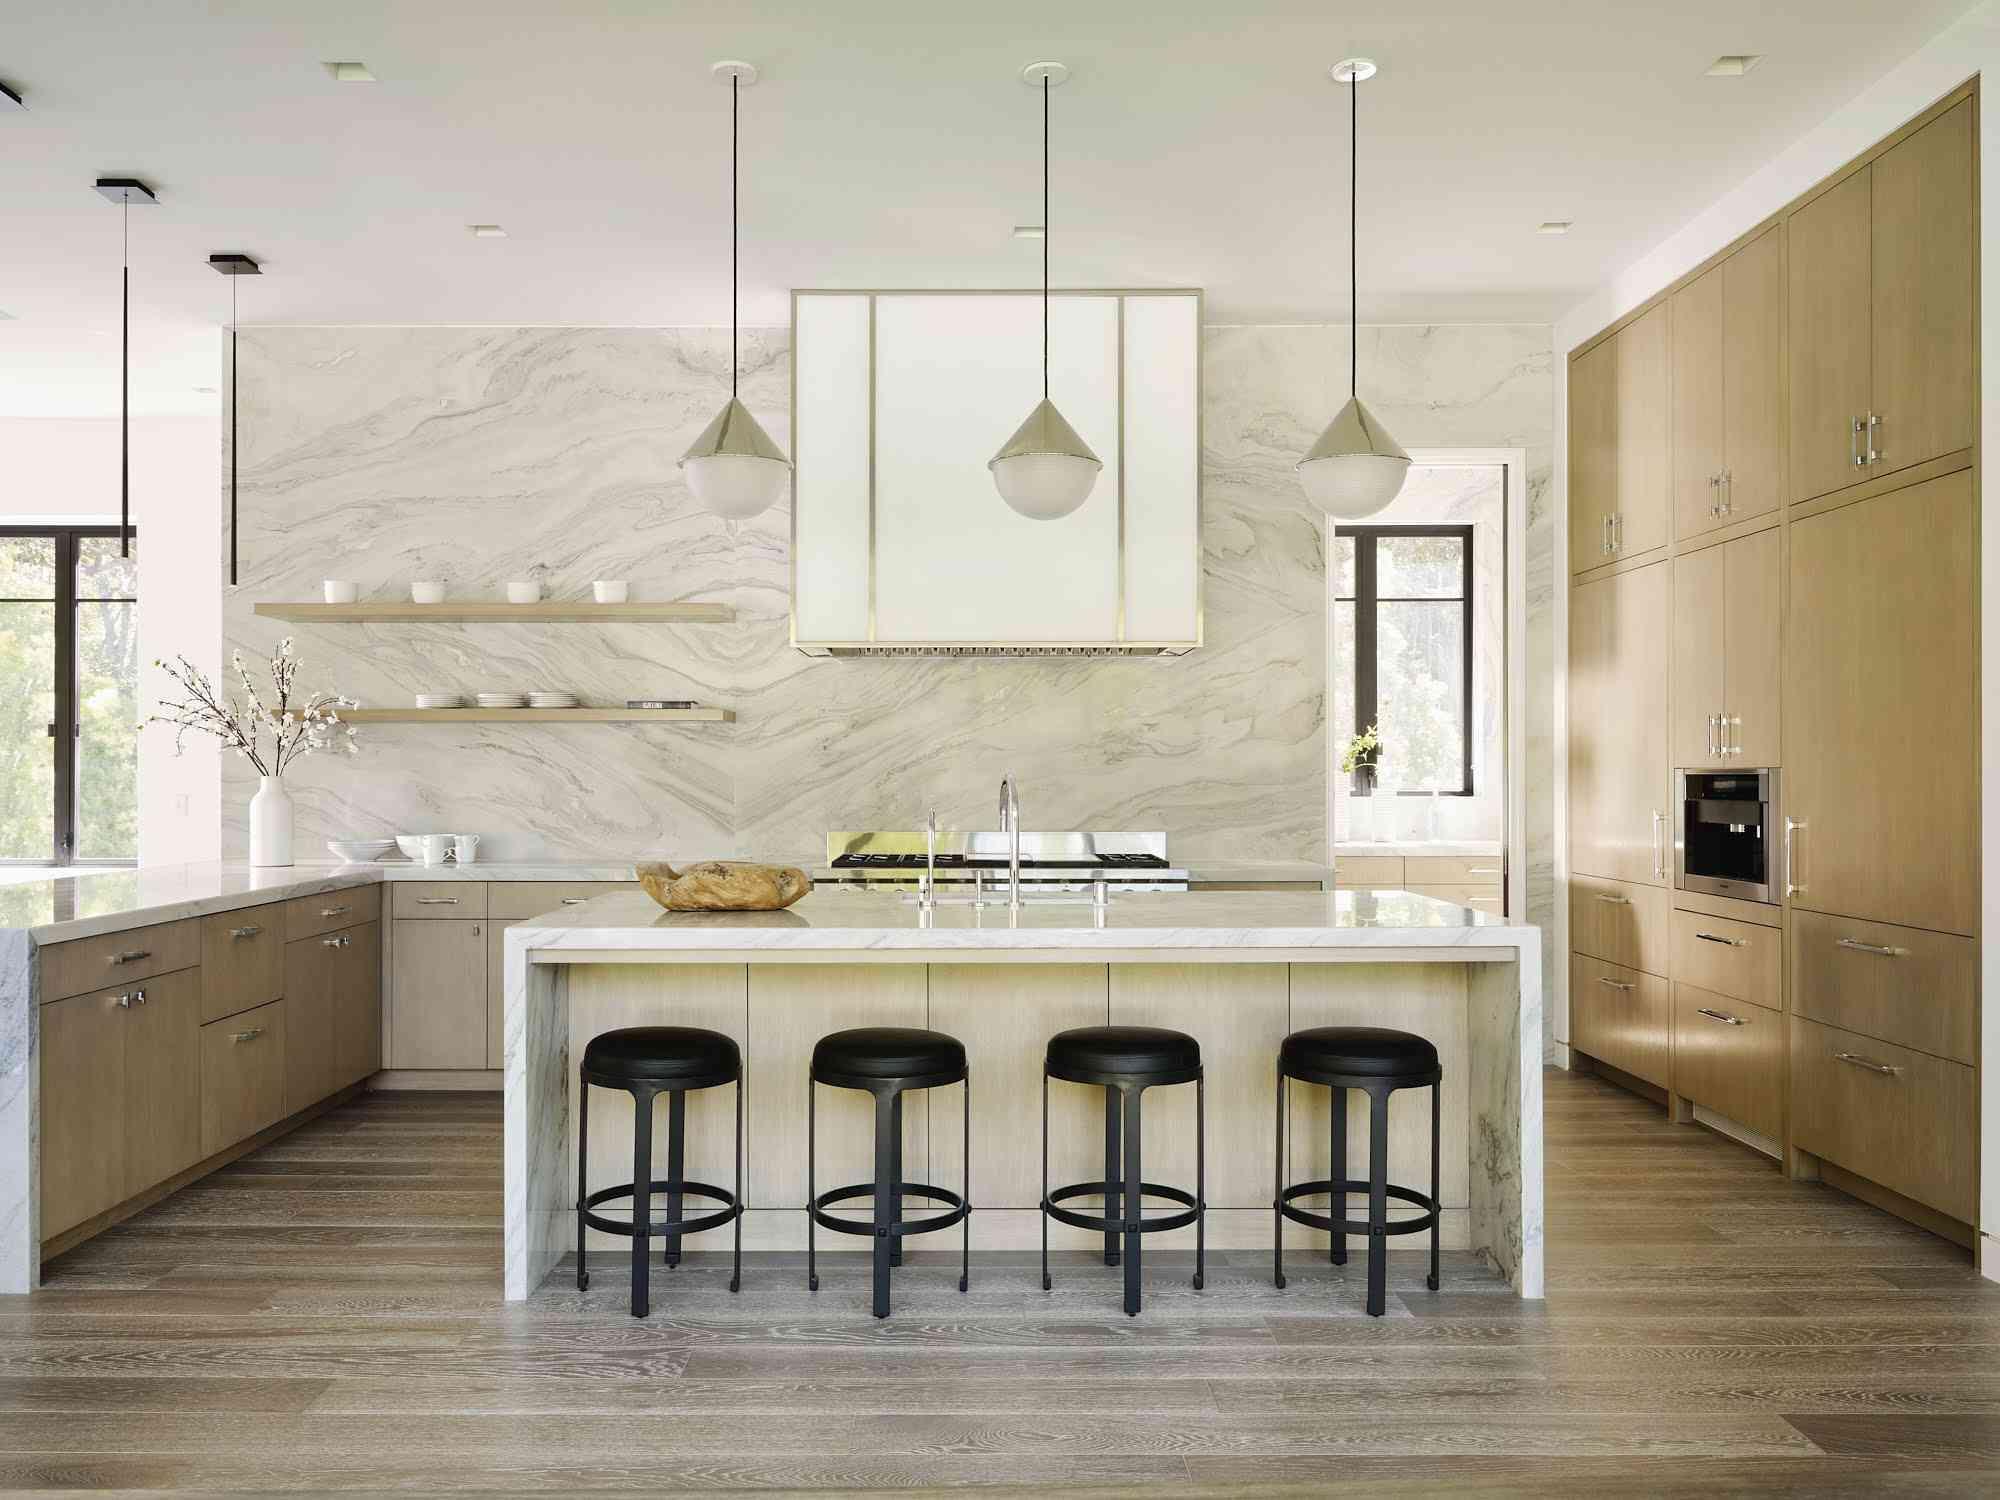 pavimento-cucina-moderna-02